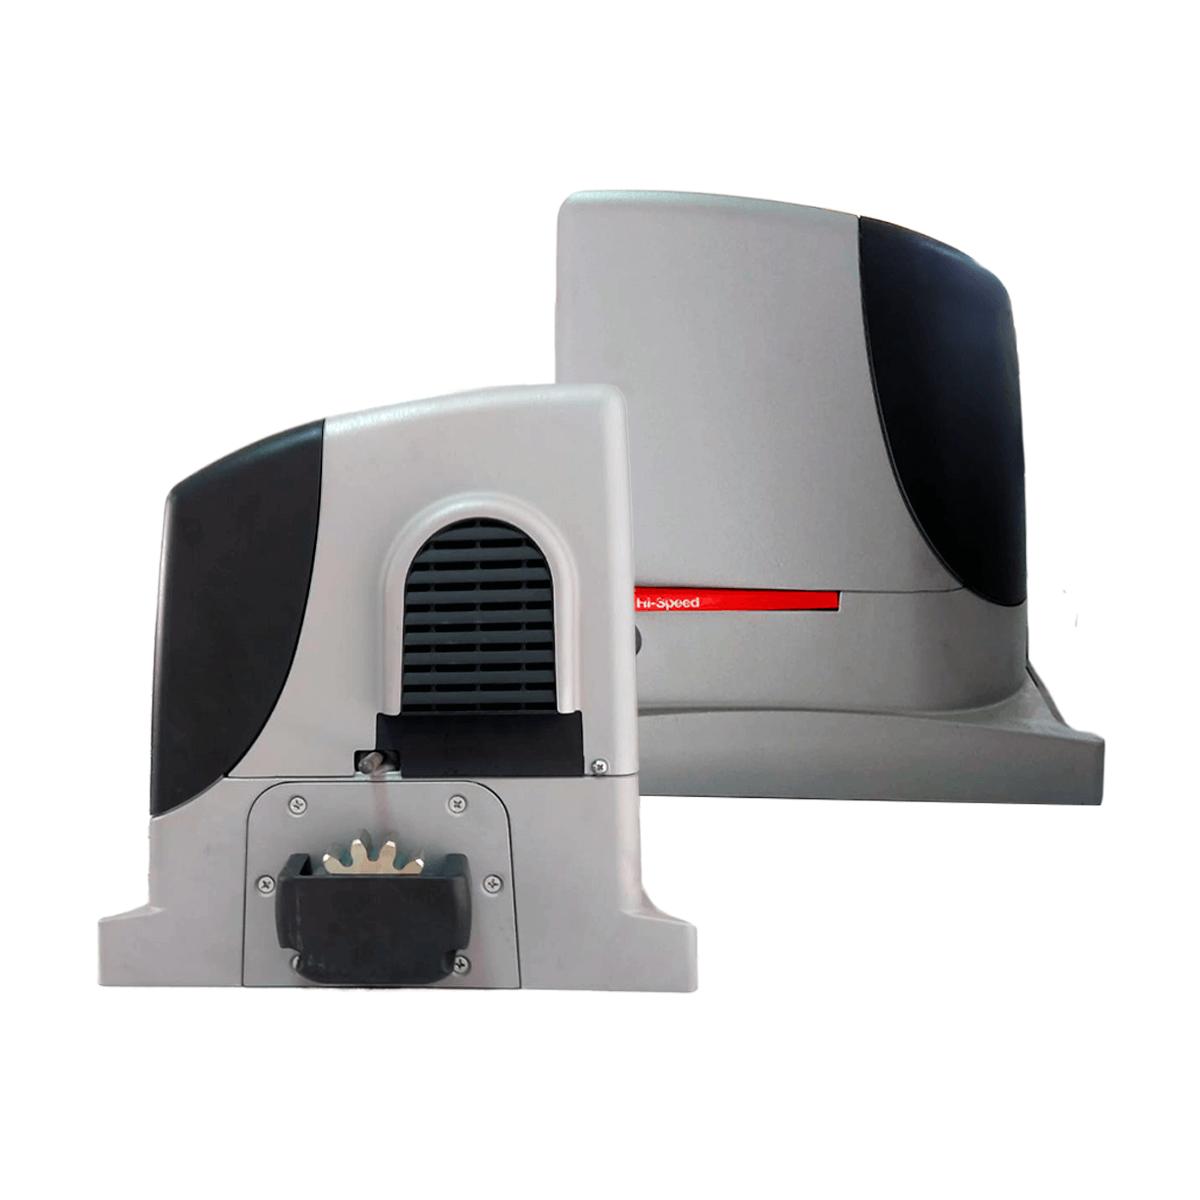 Kit Motor de Portão Deslizante Peccinin RUN 1200 i-HSC